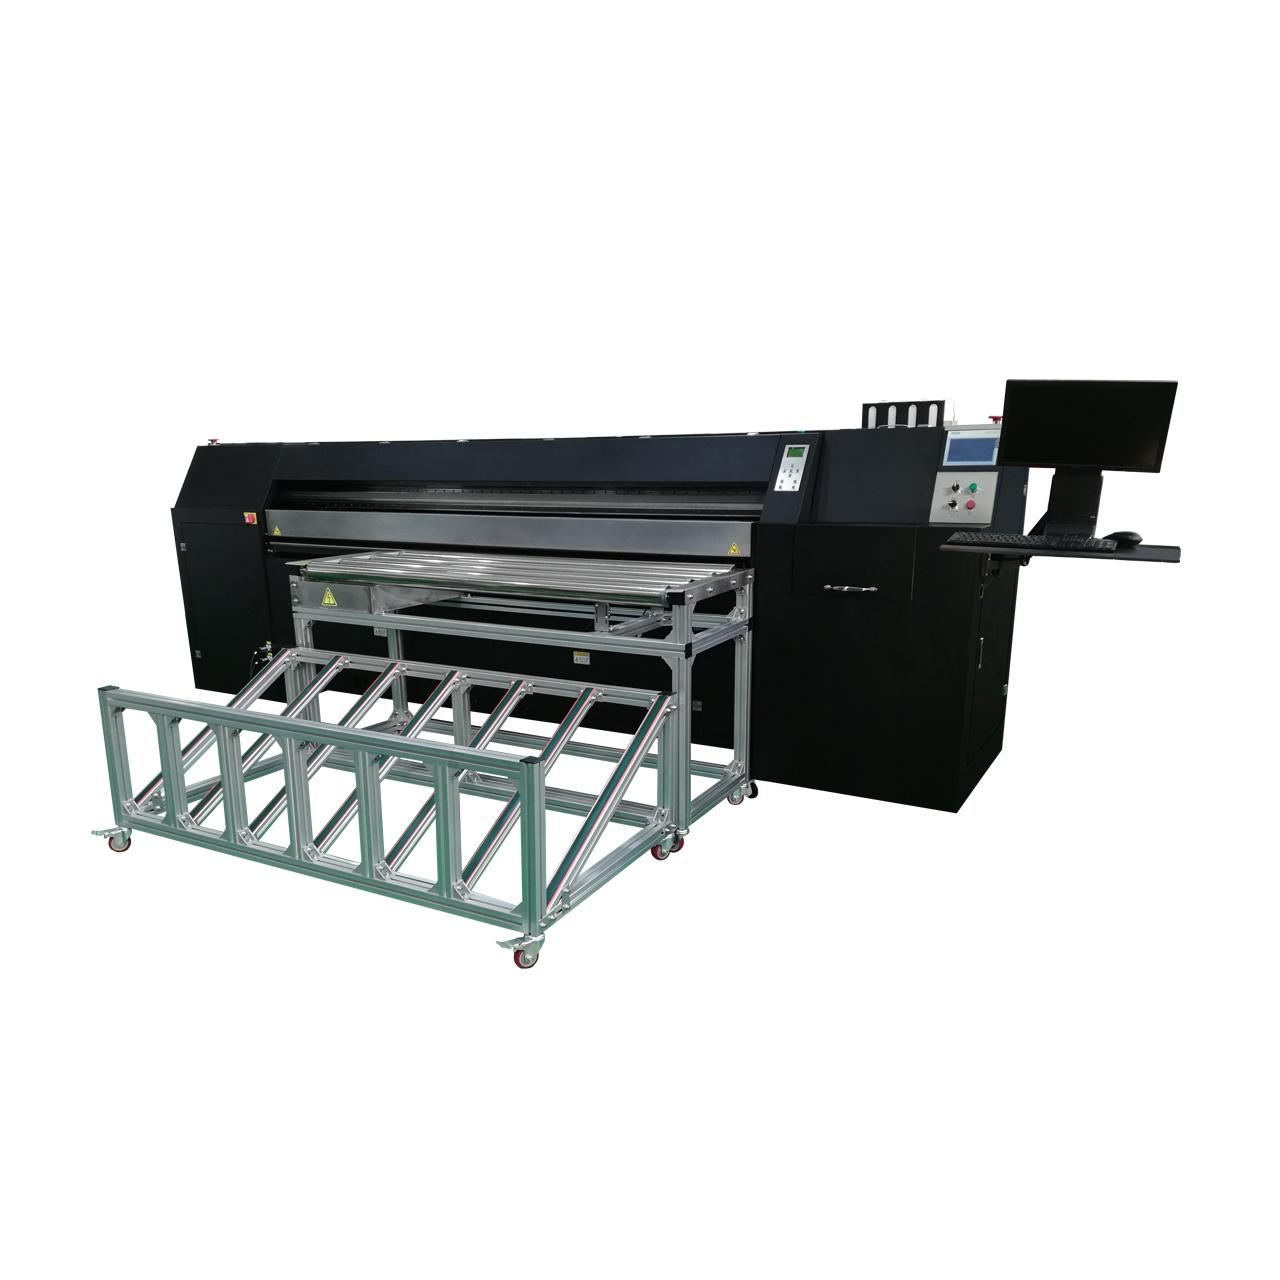 Corrugated board inkjet printer bar code inkjet printing machine 2500AF-6PH 1